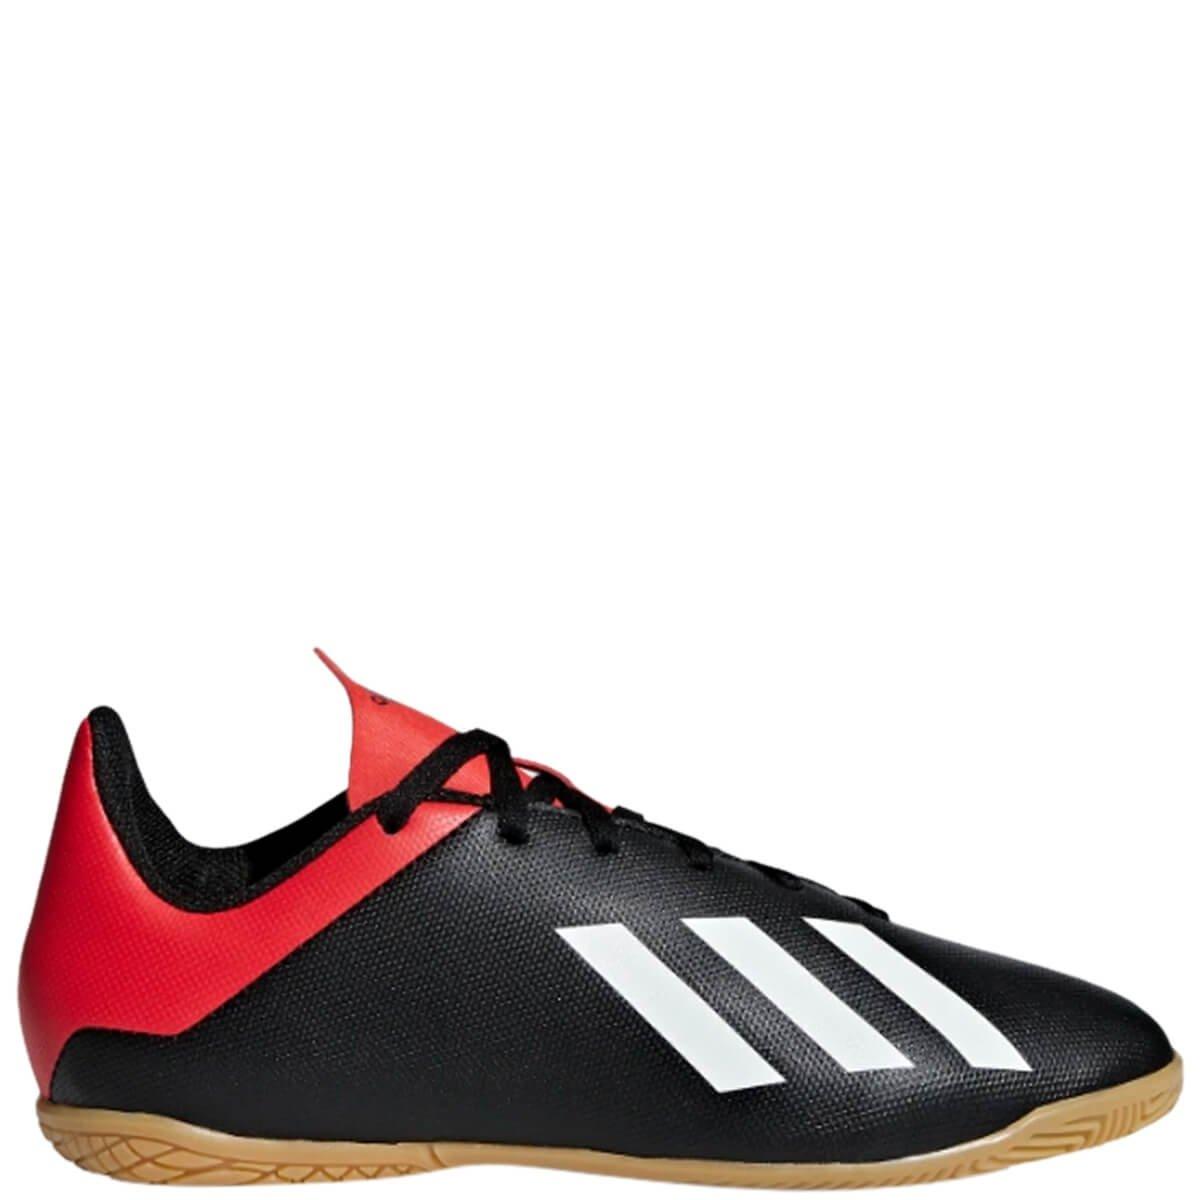 36f874c8a9 Chuteira Infantil Futsal Adidas X 18.4 Bb9409 - Preto Vermelho ...